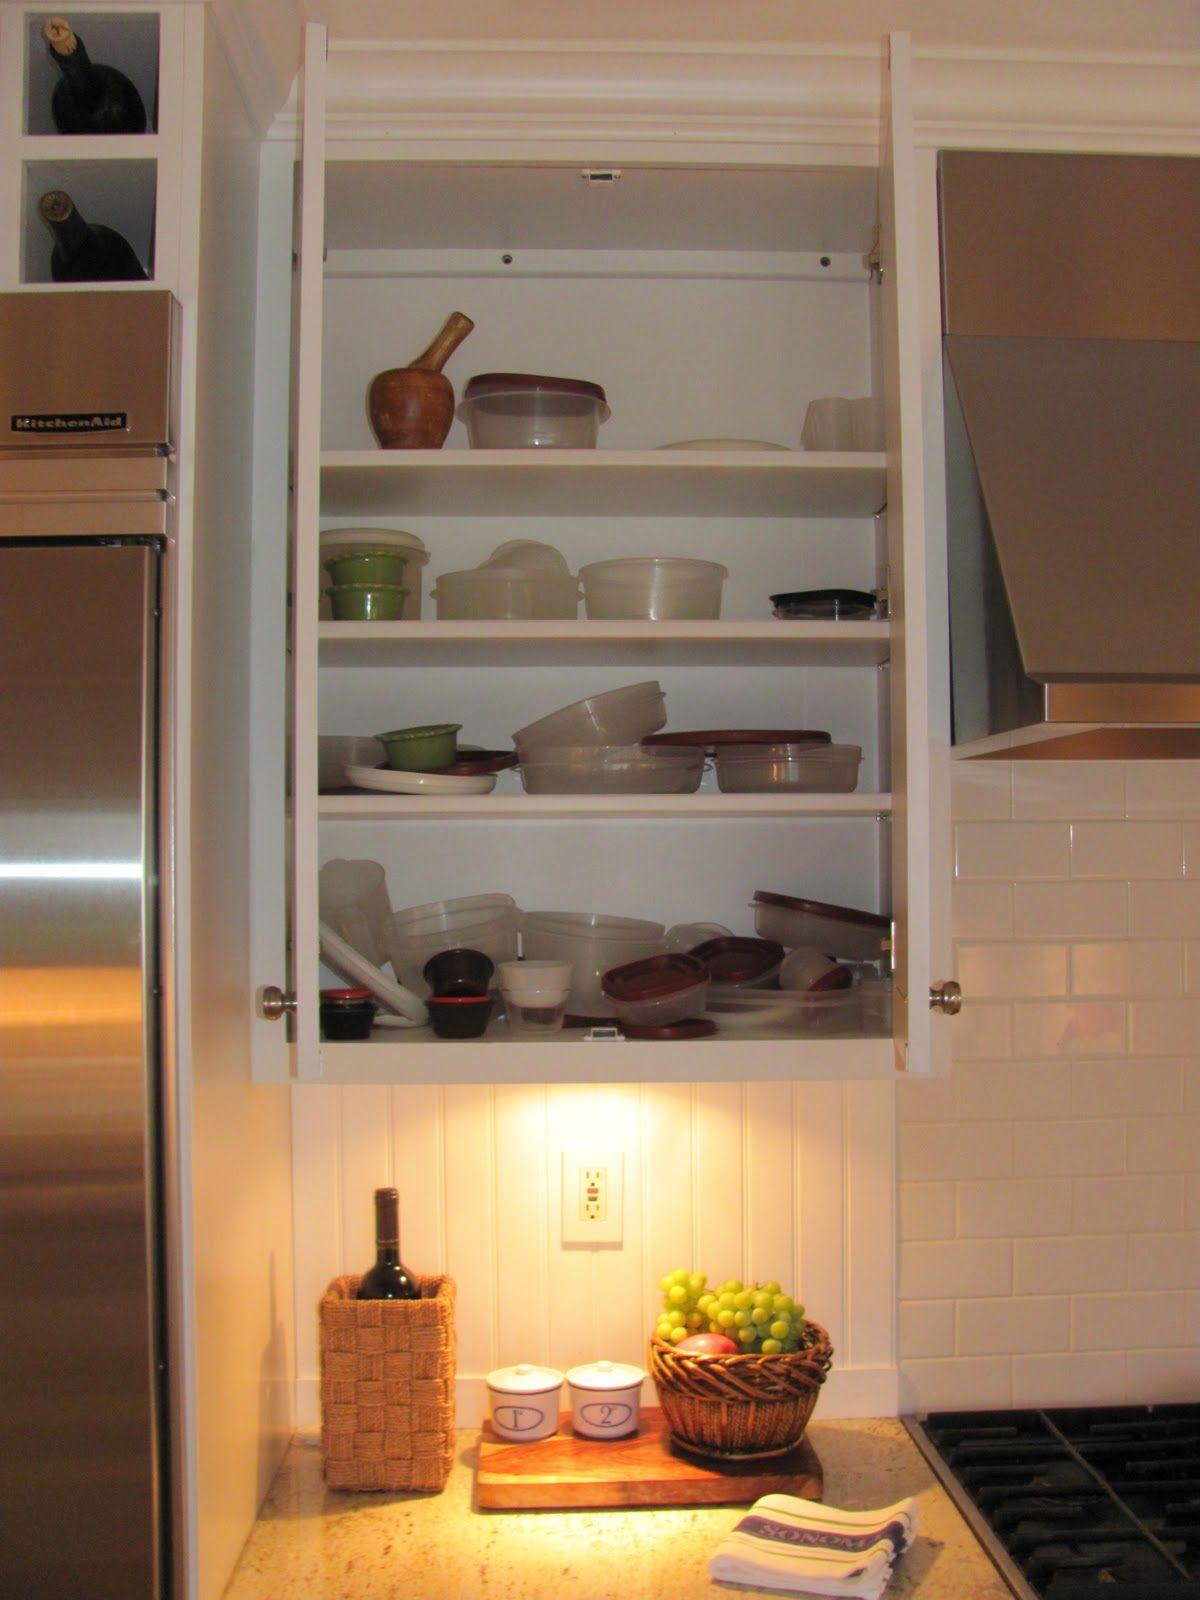 Best Shelf Liners For Kitchen Cabinets Sink Cabinet Liner Your Entrancing Kitchen Cabinet Liners Decorating Design